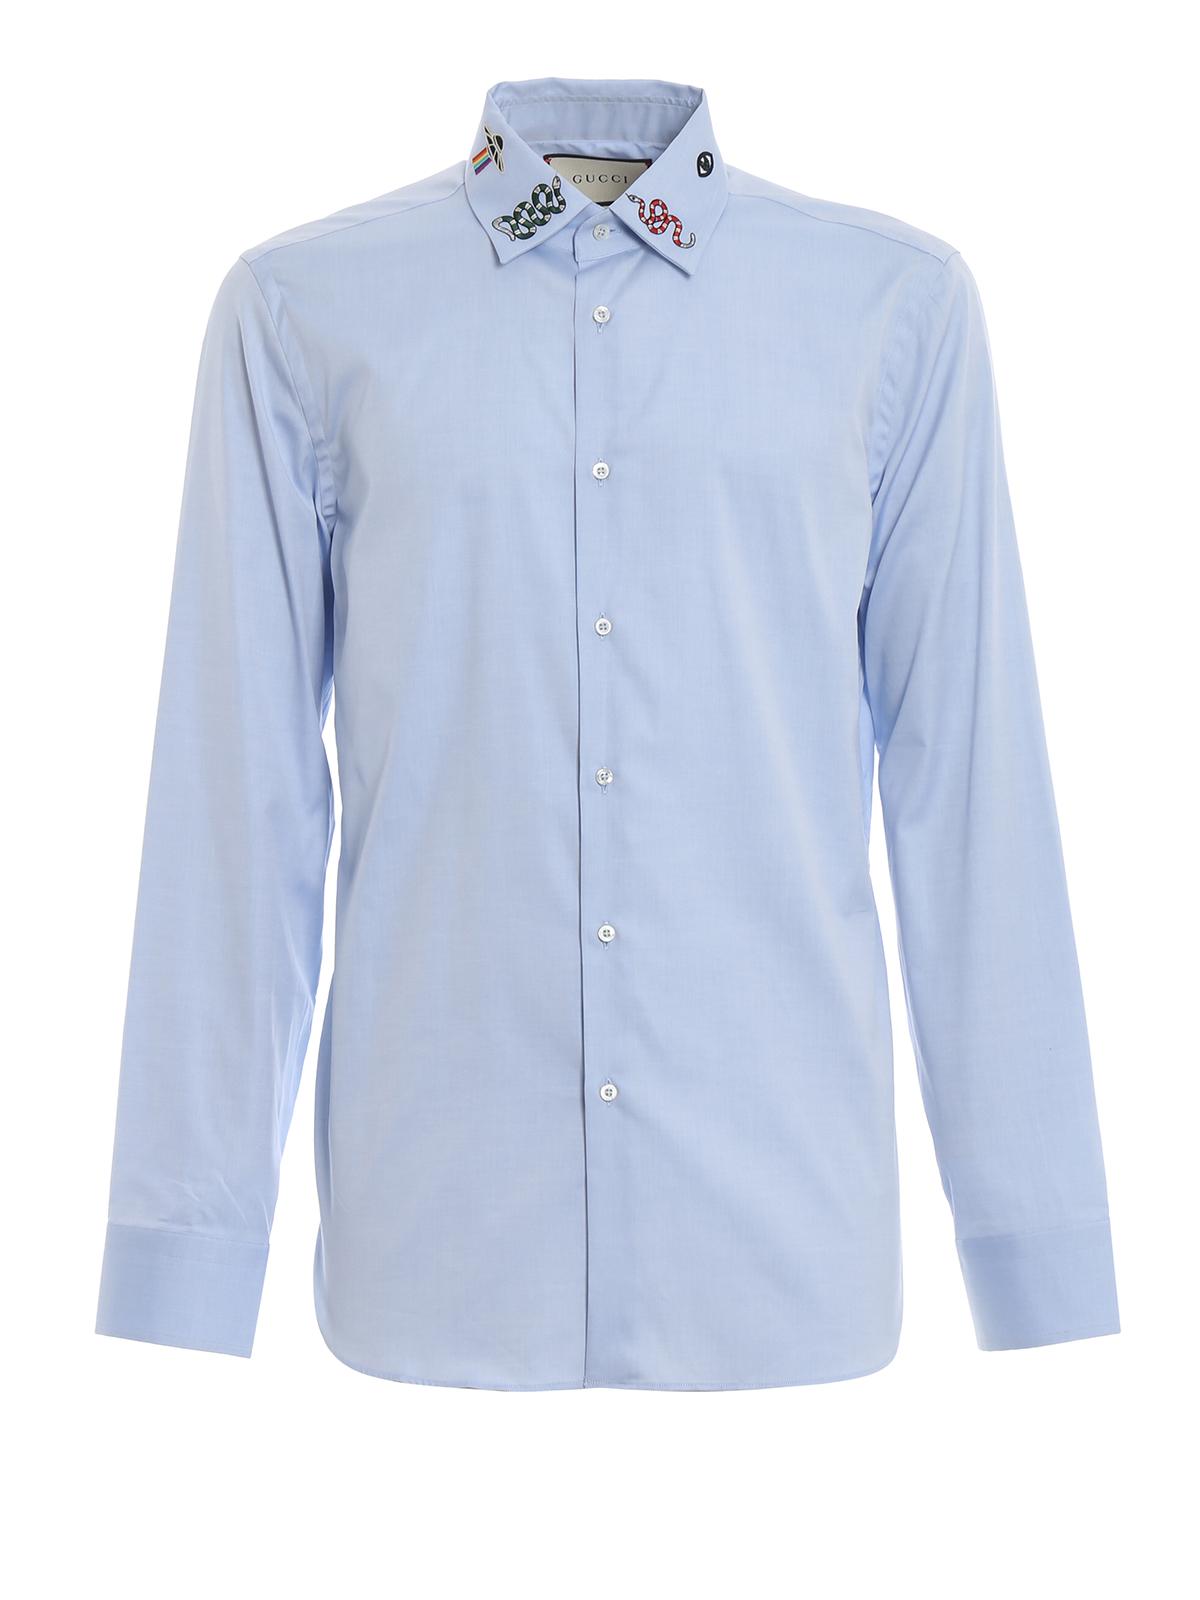 5ec503d4da3 Gucci - Embroidered collar cotton shirt - shirts - 523500Z341L4851